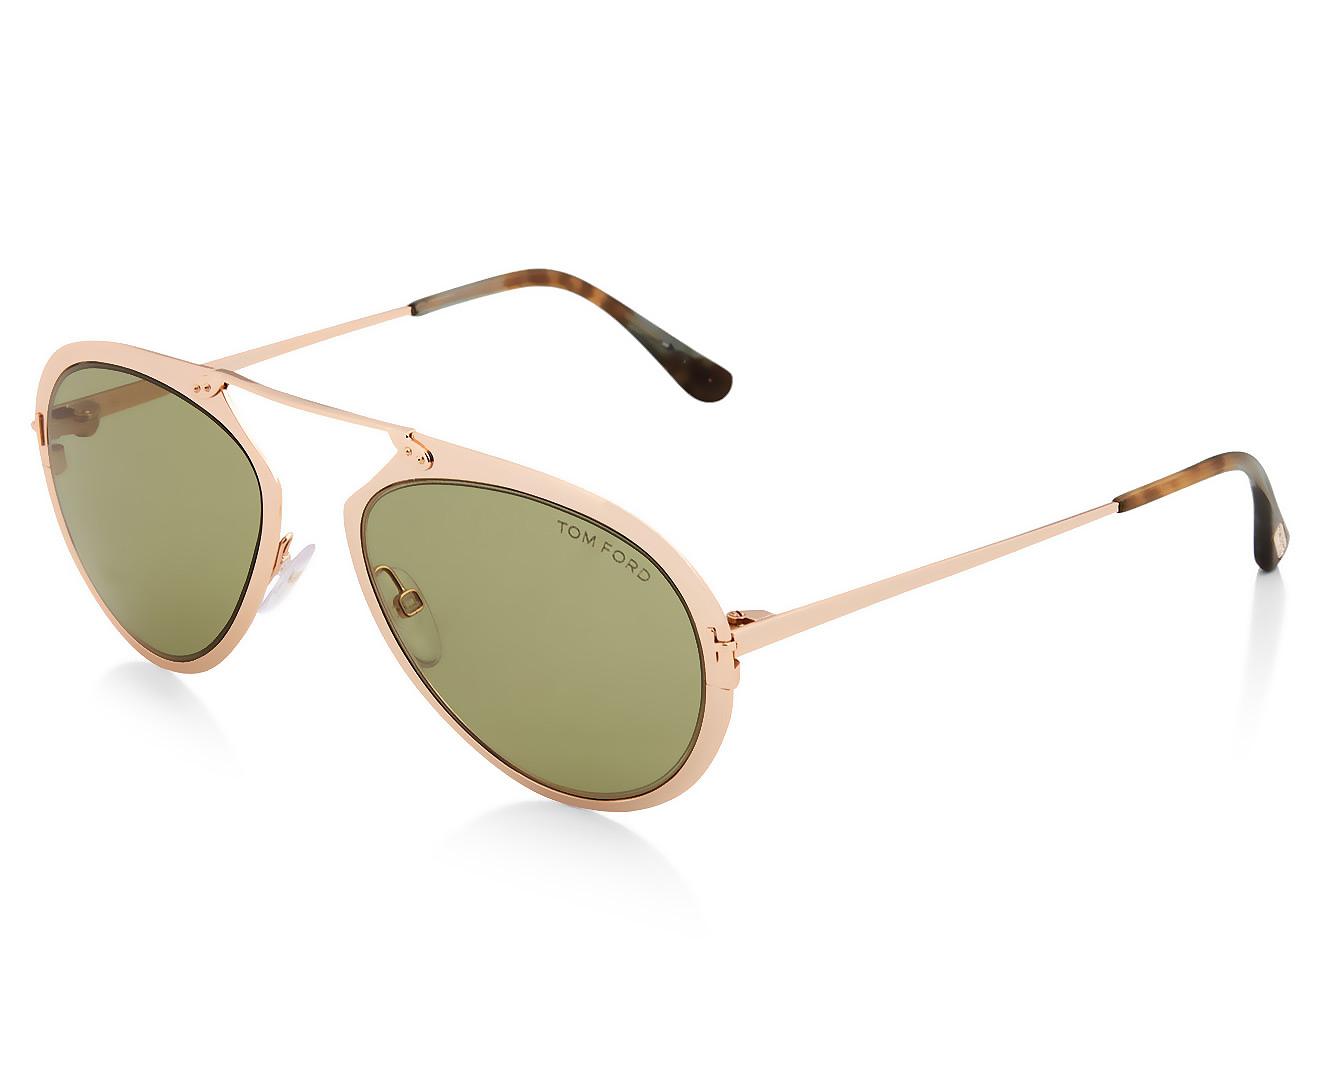 0322f5f997d Tom Ford Dashel Sunglasses - Rose Gold